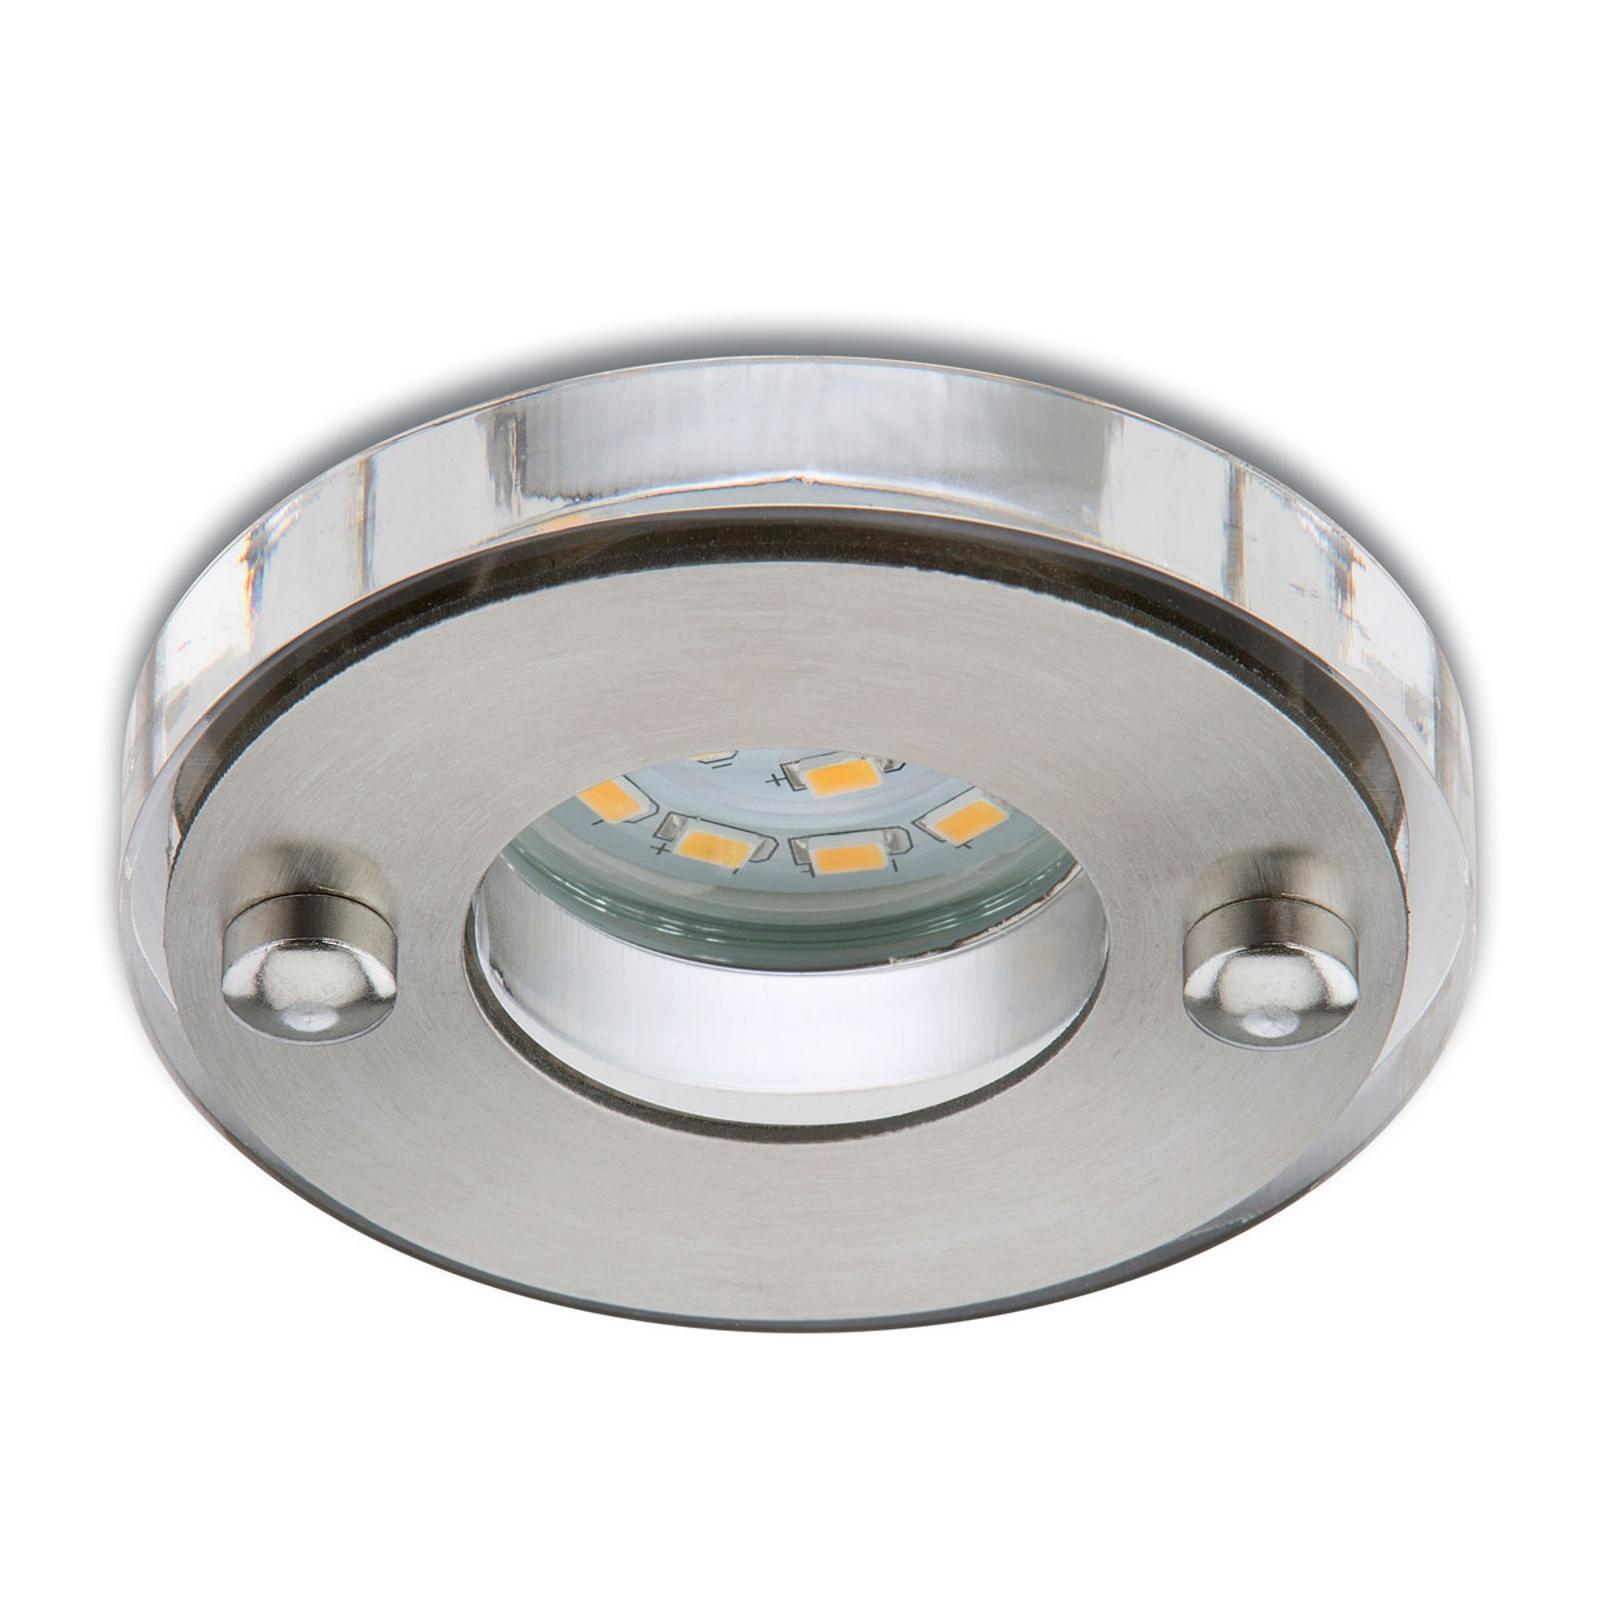 Matt-nickelfarbener LED-Einbaustrahler Nikas  IP23